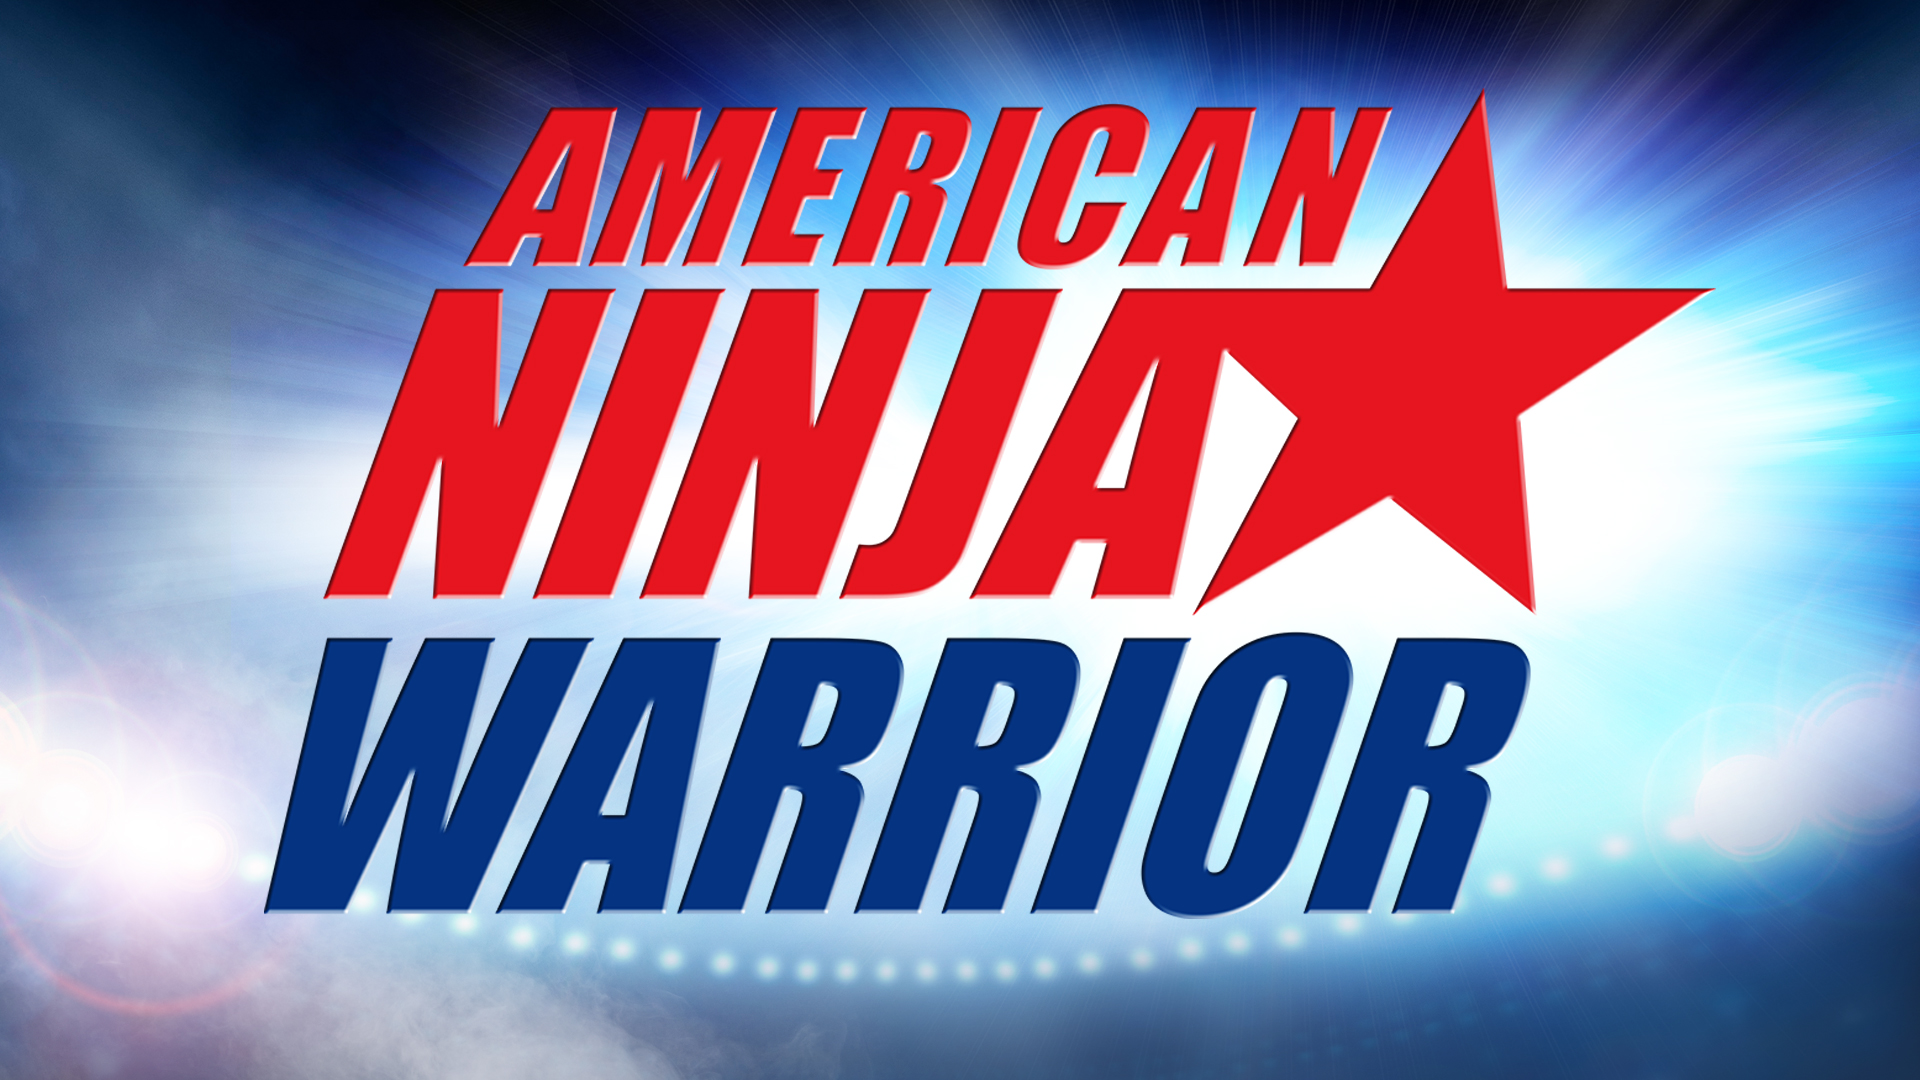 American ninja warrior nbc com